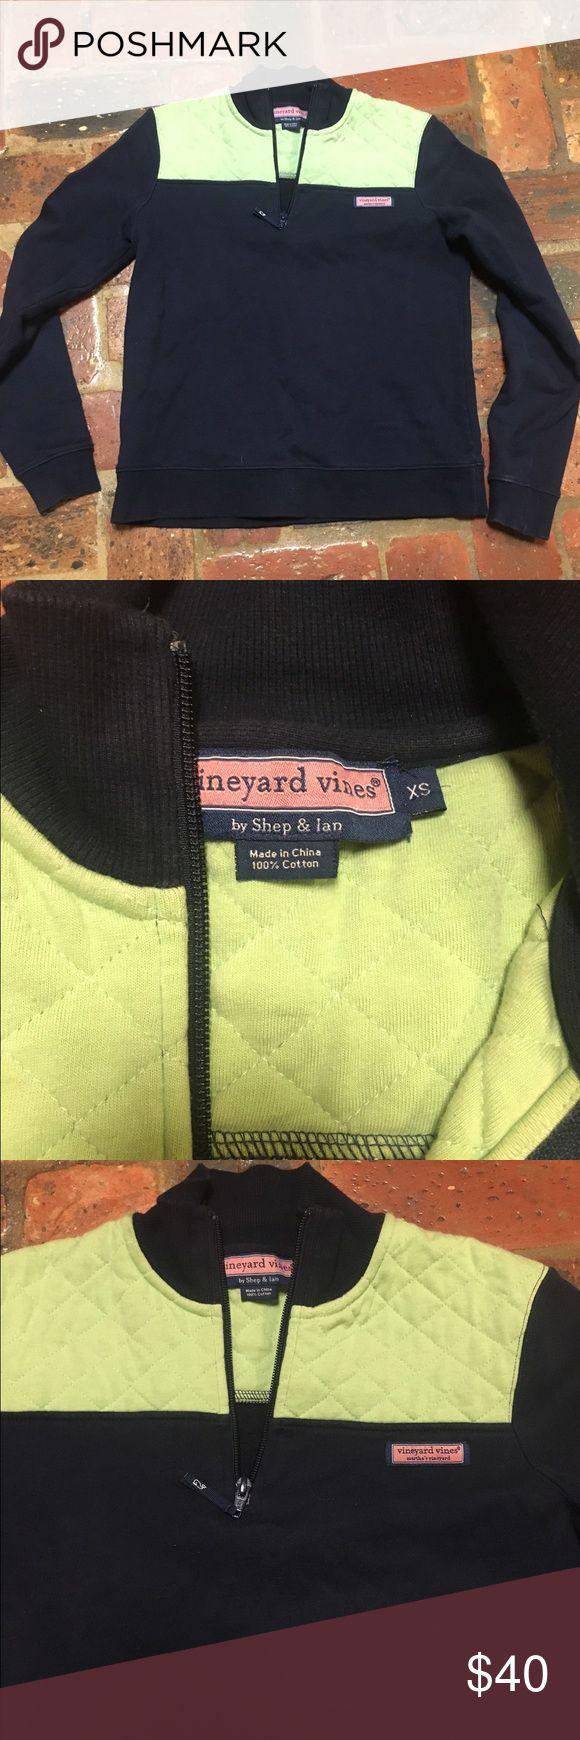 SALE!!! Vineyard Vines shep pullover Good used condition Vineyard Vines Sweaters